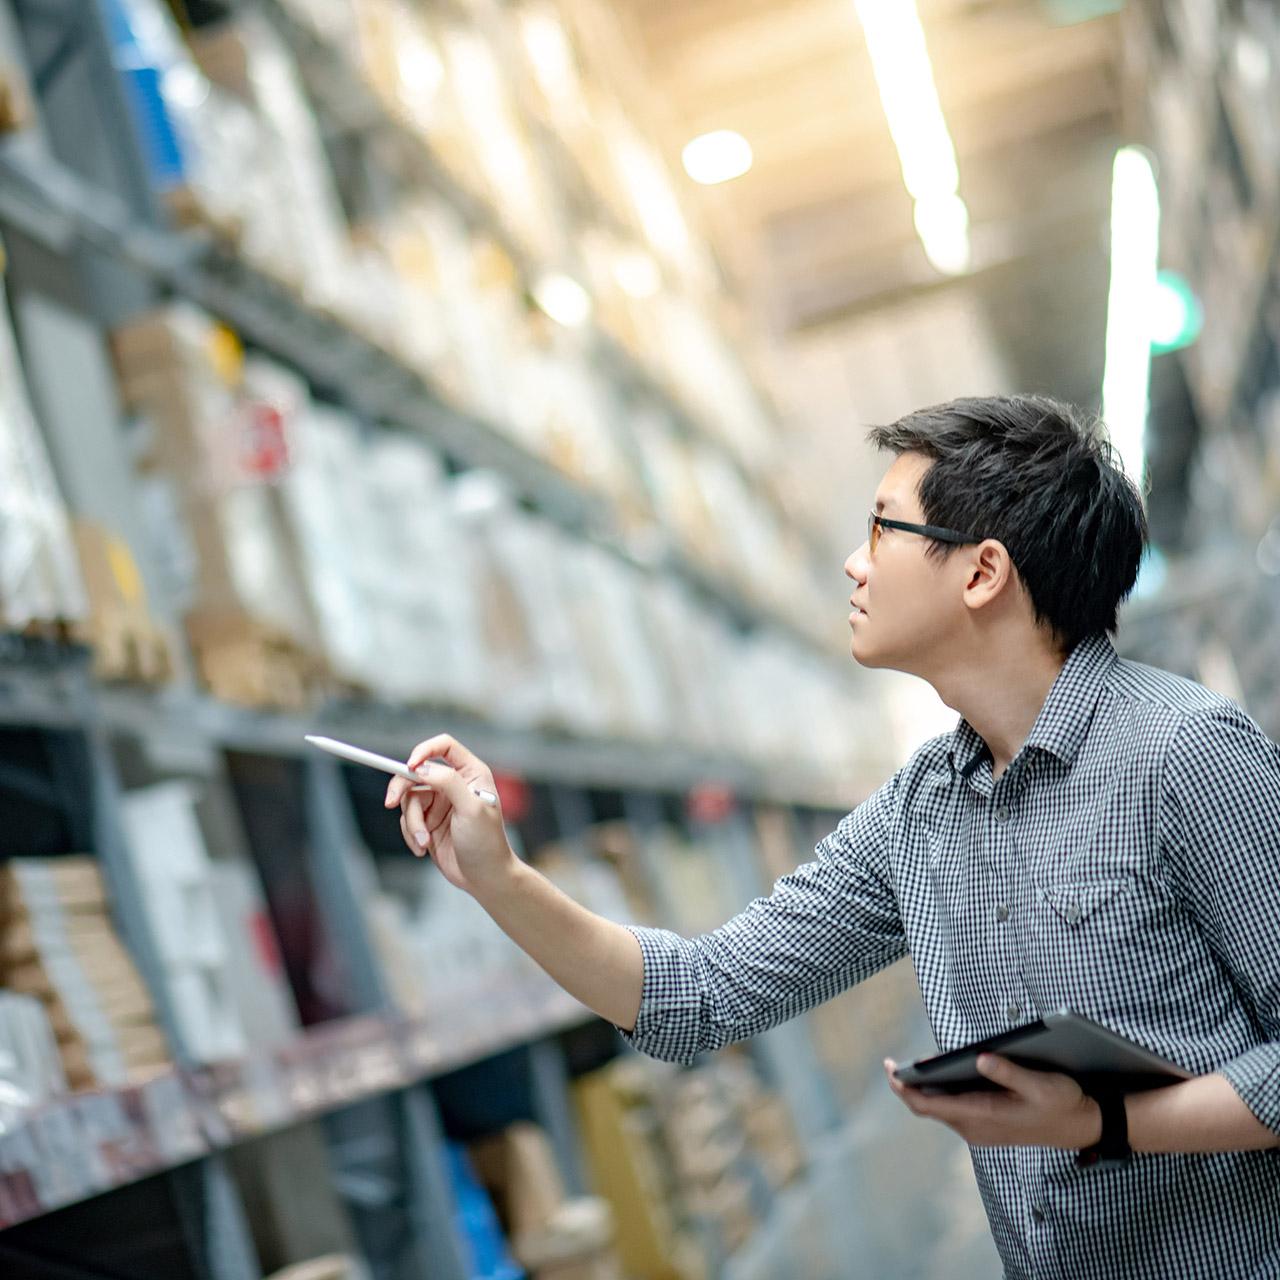 distributor inventory and vendor management